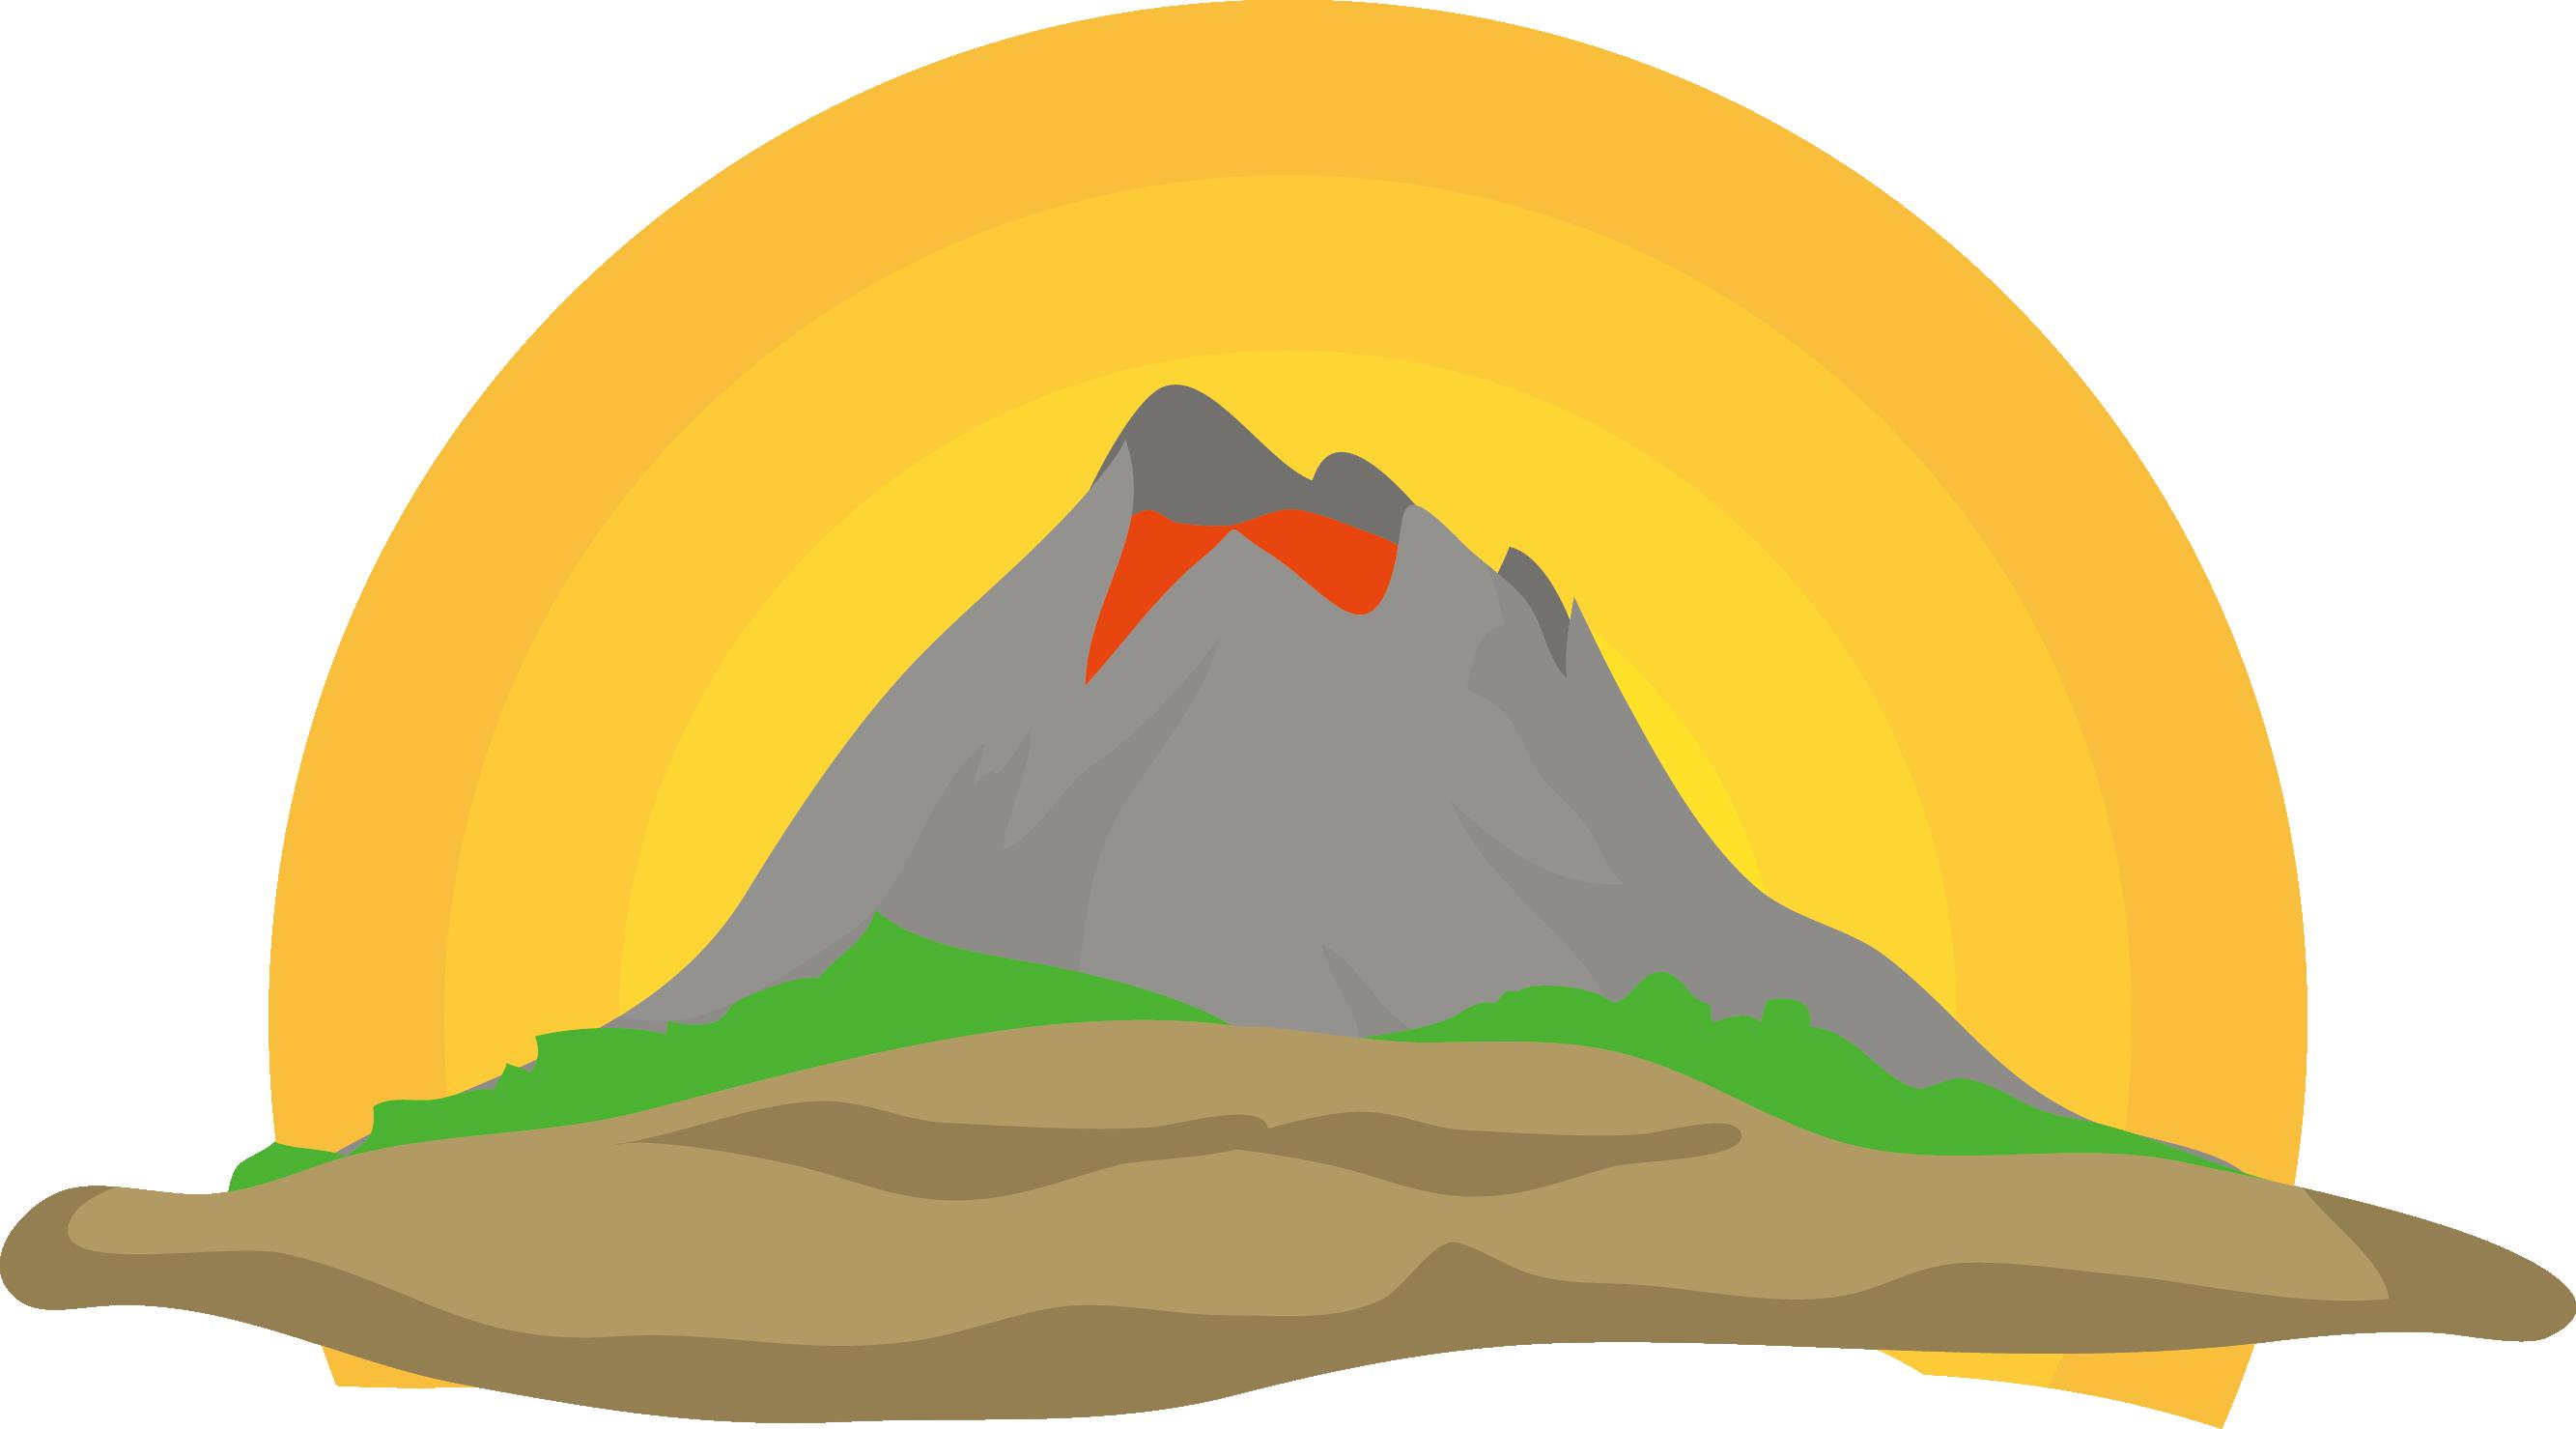 Clipart mountains volcano, Clipart mountains volcano.